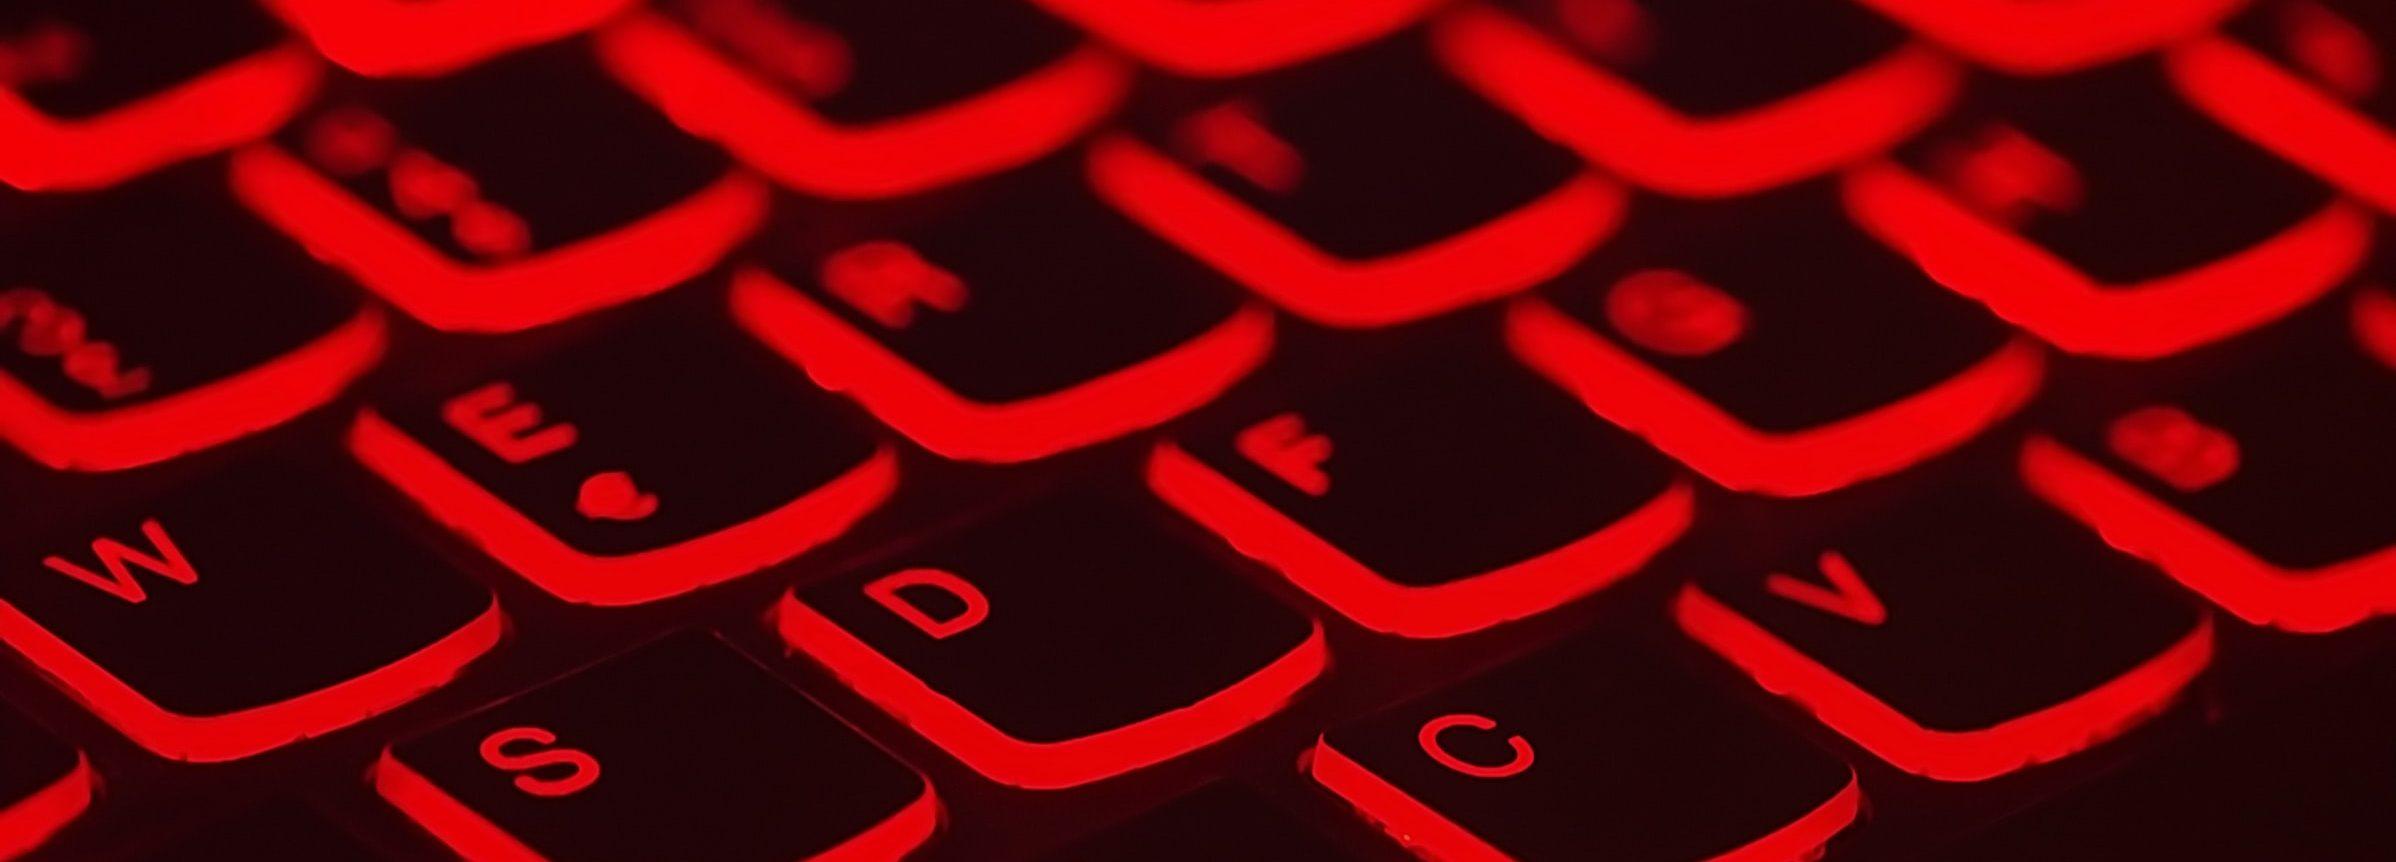 Como se preparar para os riscos cibernéticos